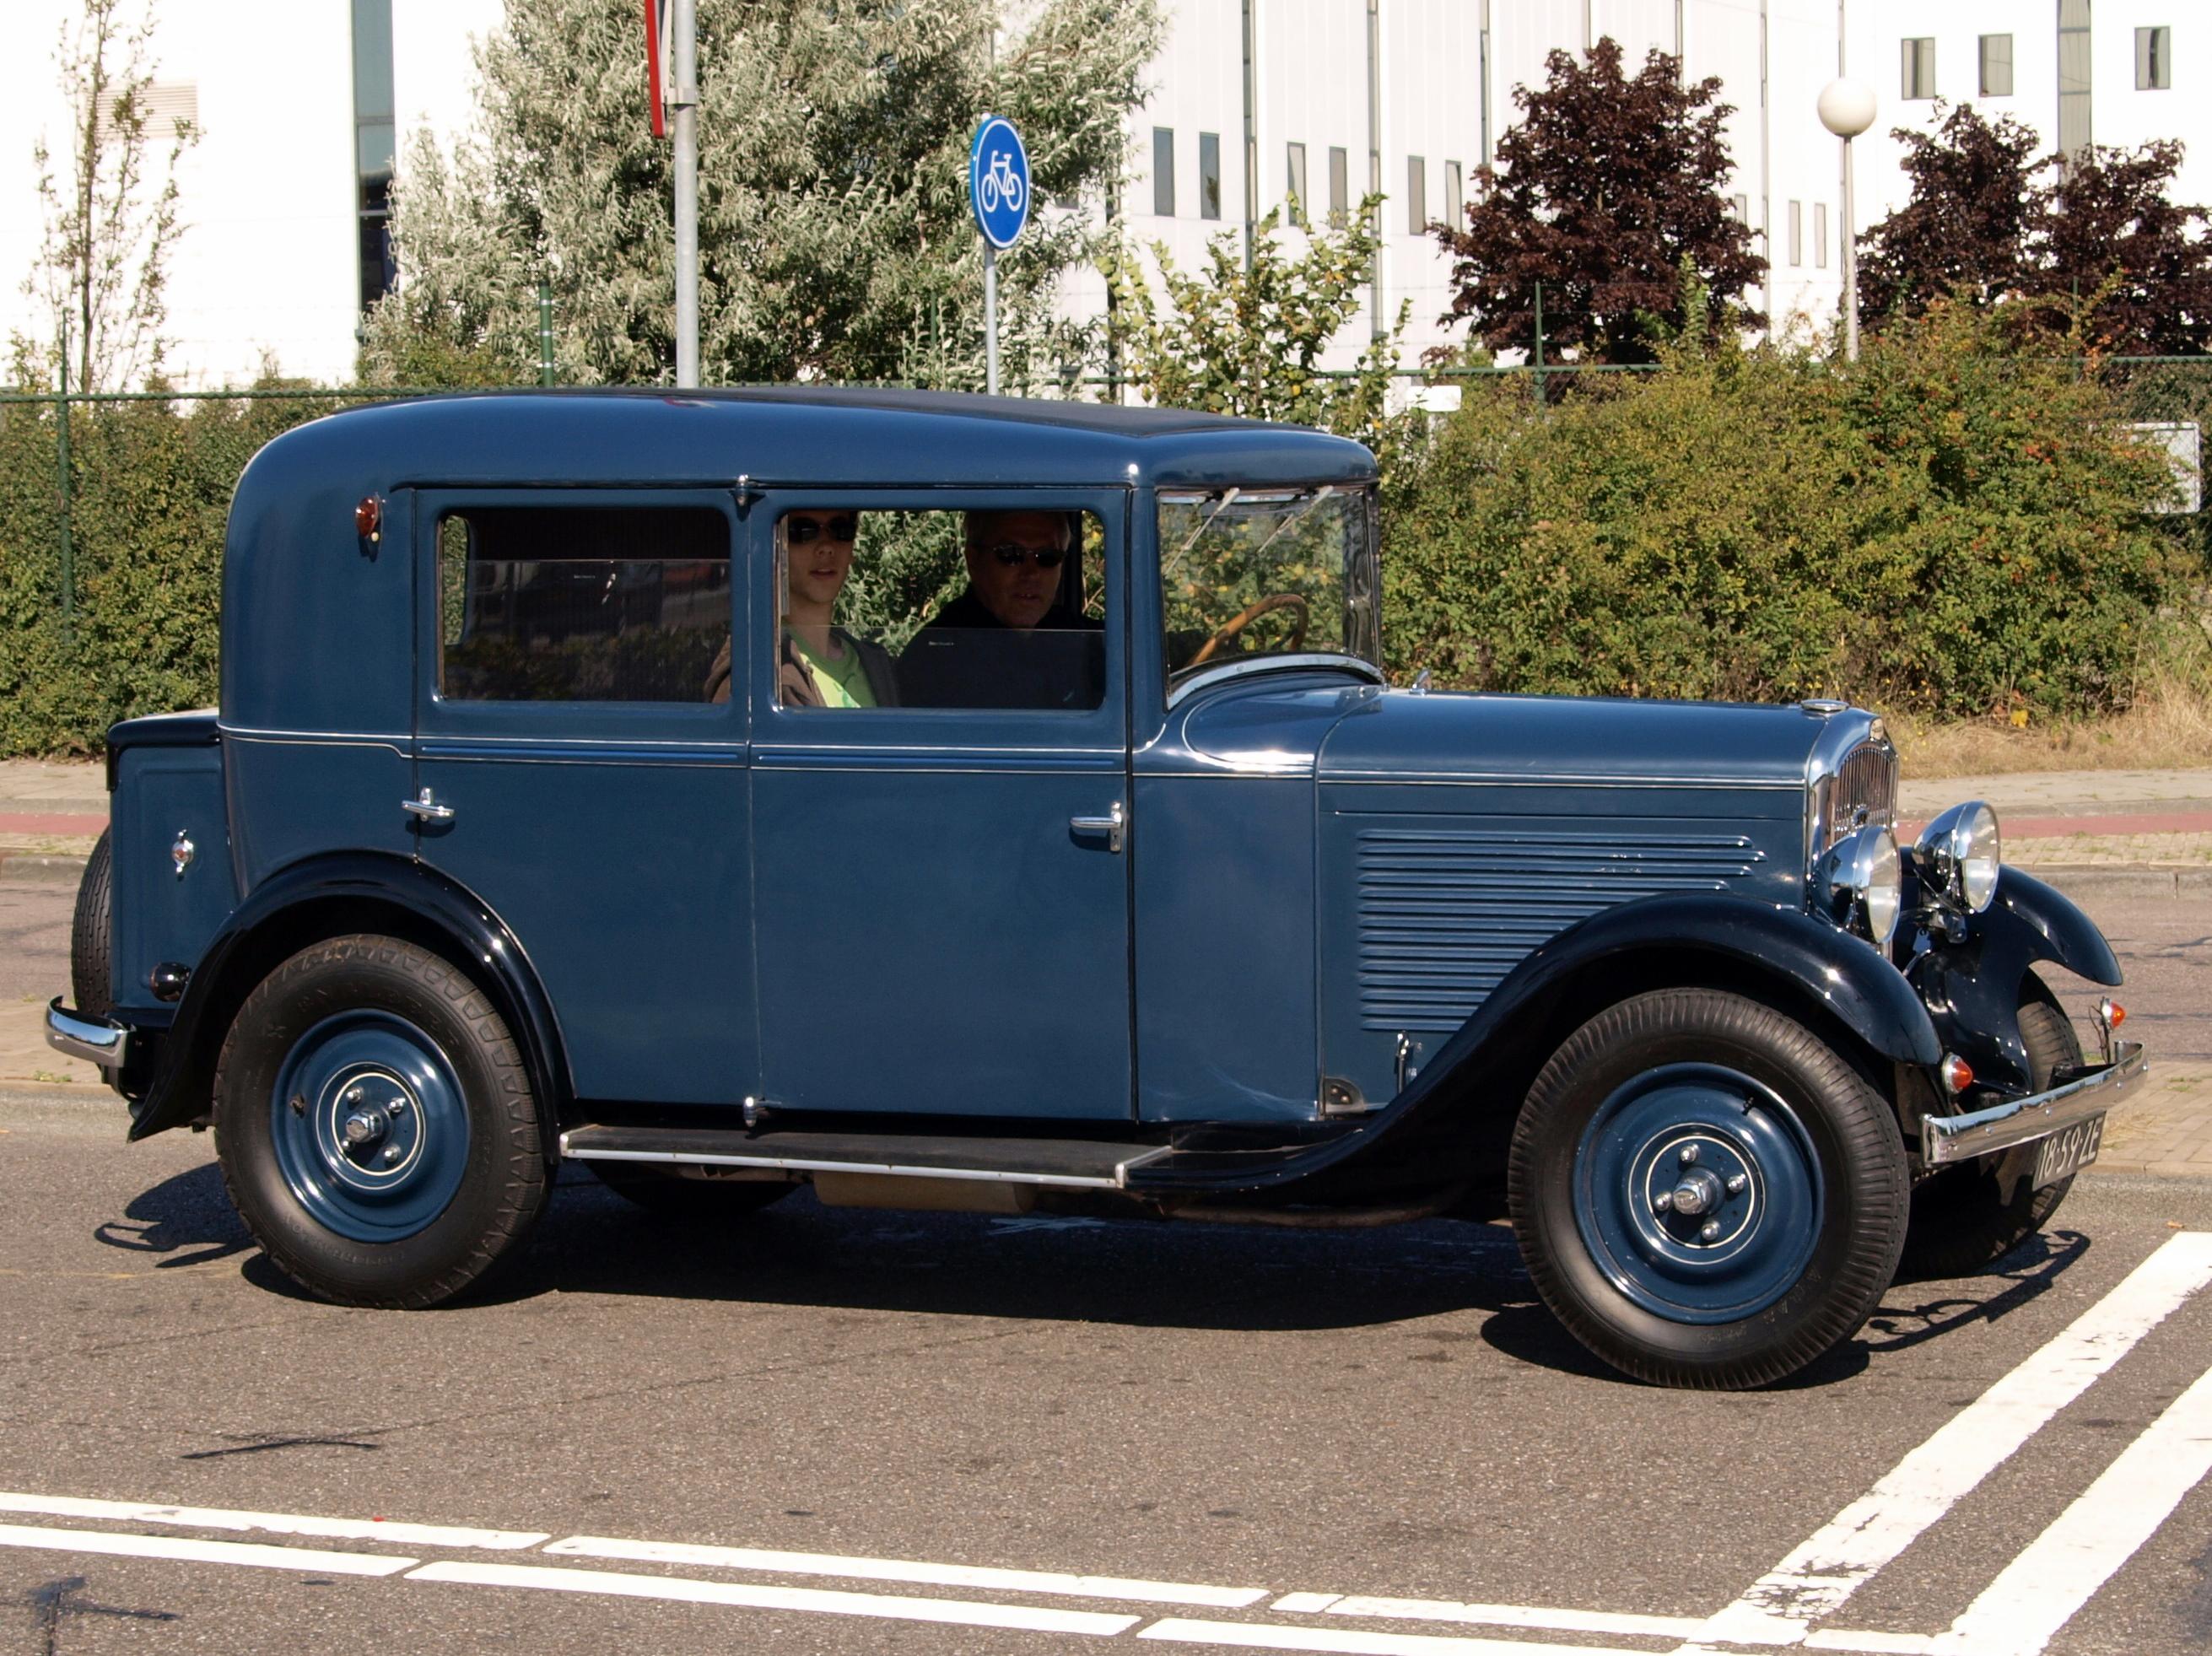 File:Peugeot 201 C 18-59-ZE pic7.JPG - Wikimedia Commons